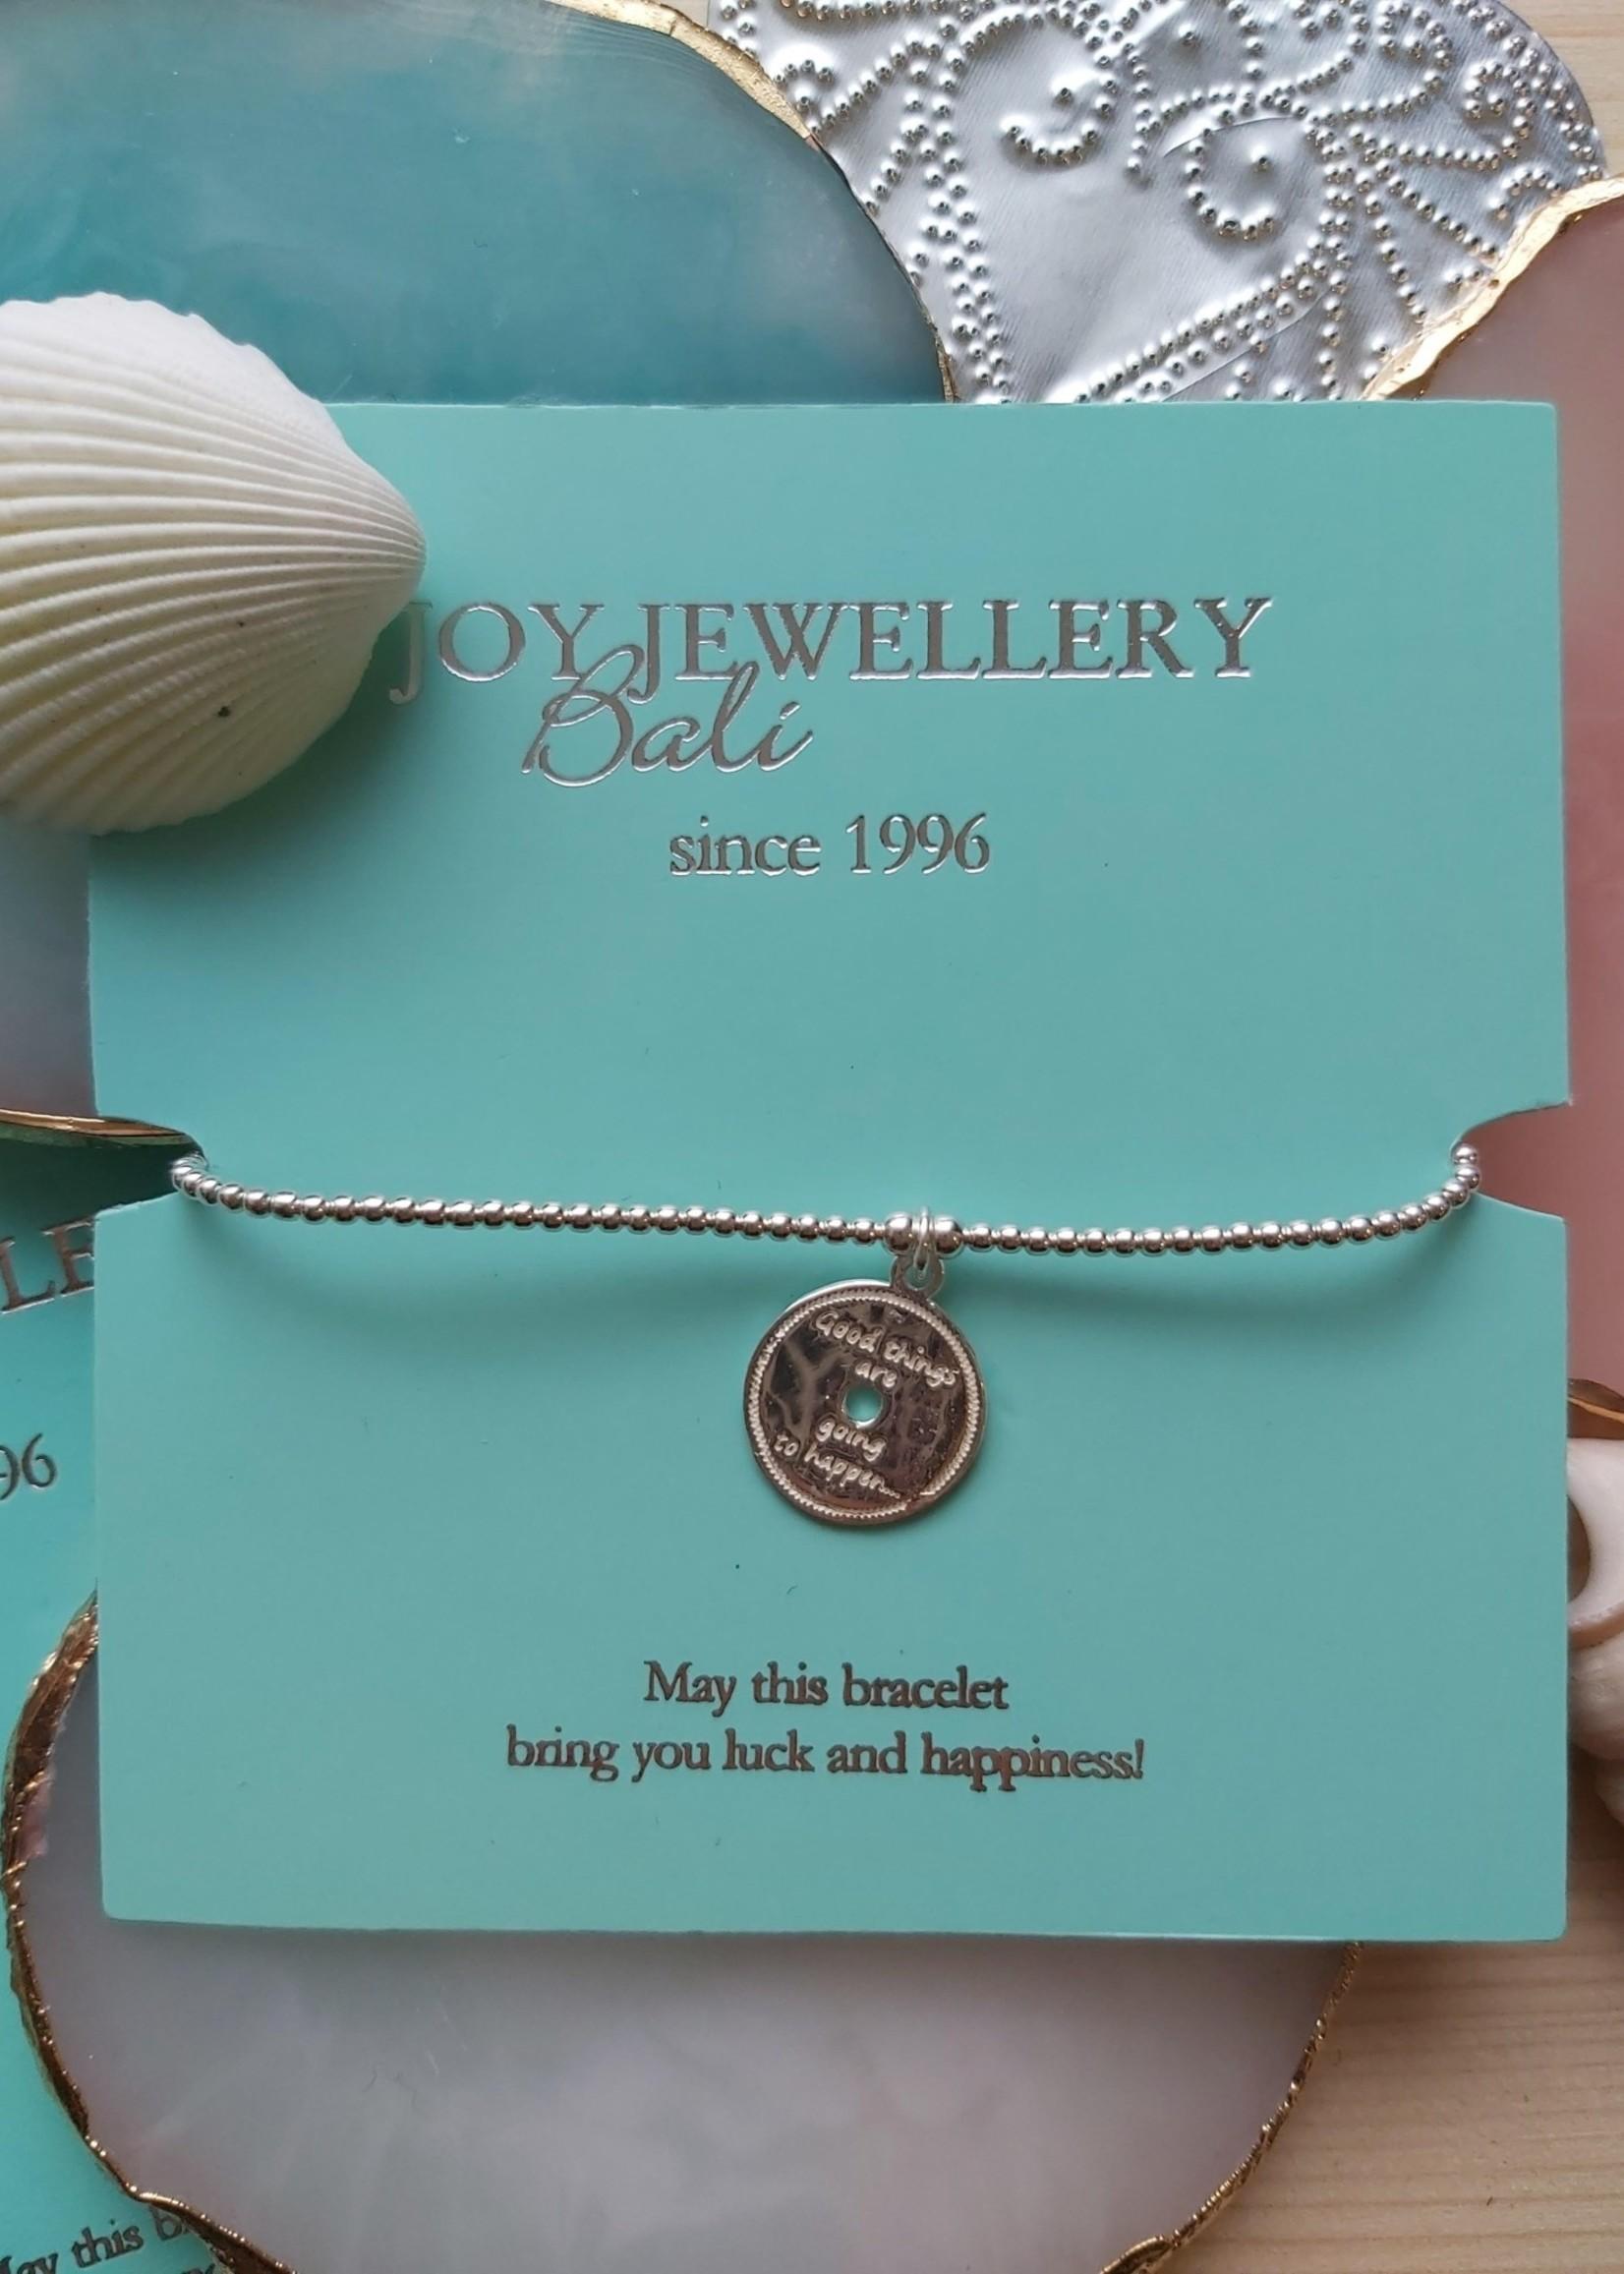 Joy Bali JOY Tiny Wish armband - Good Things